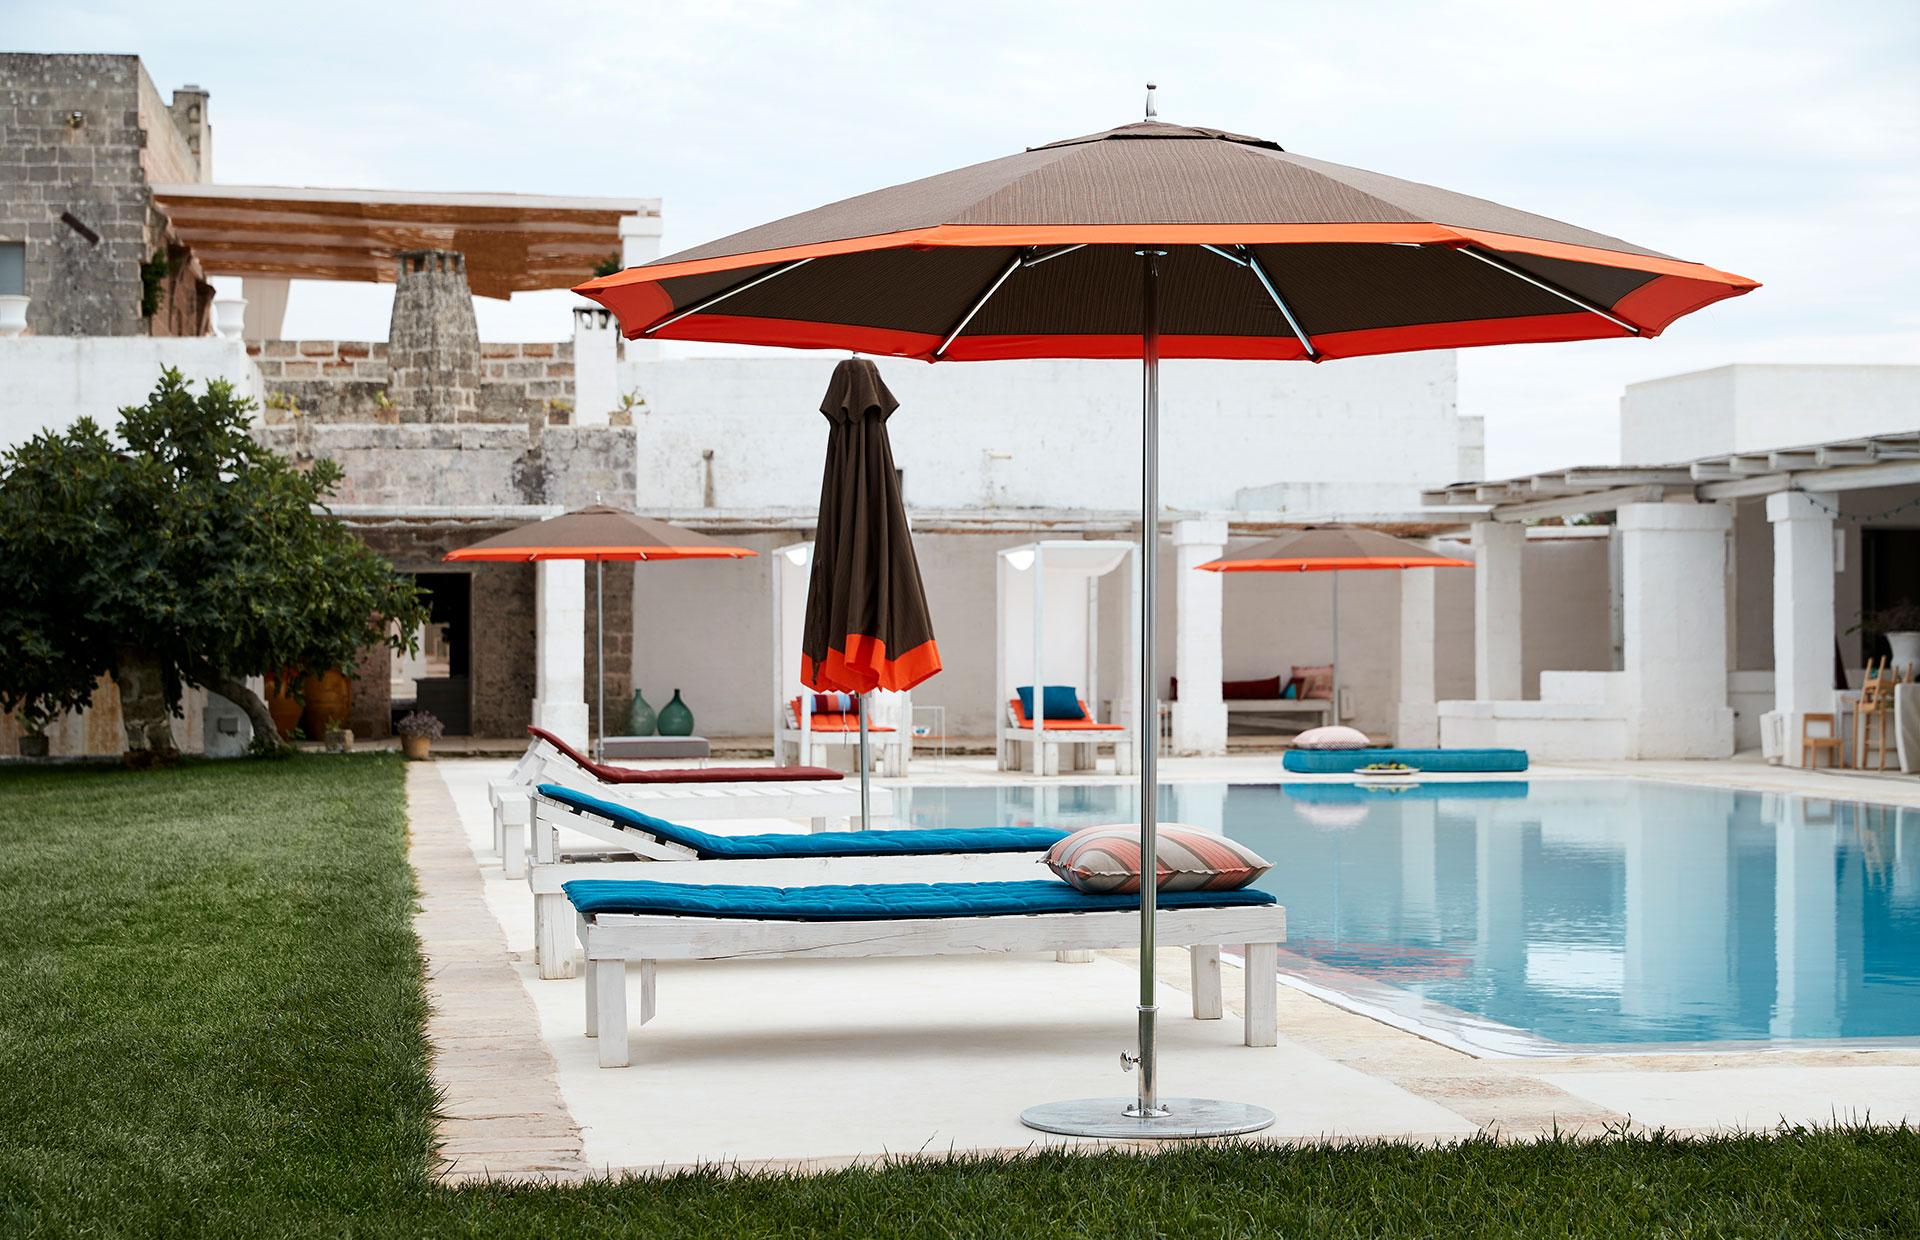 Sunbrella® image(s) provided by Glen Raven, Inc., owner of the Sunbrella Registered Trademark.